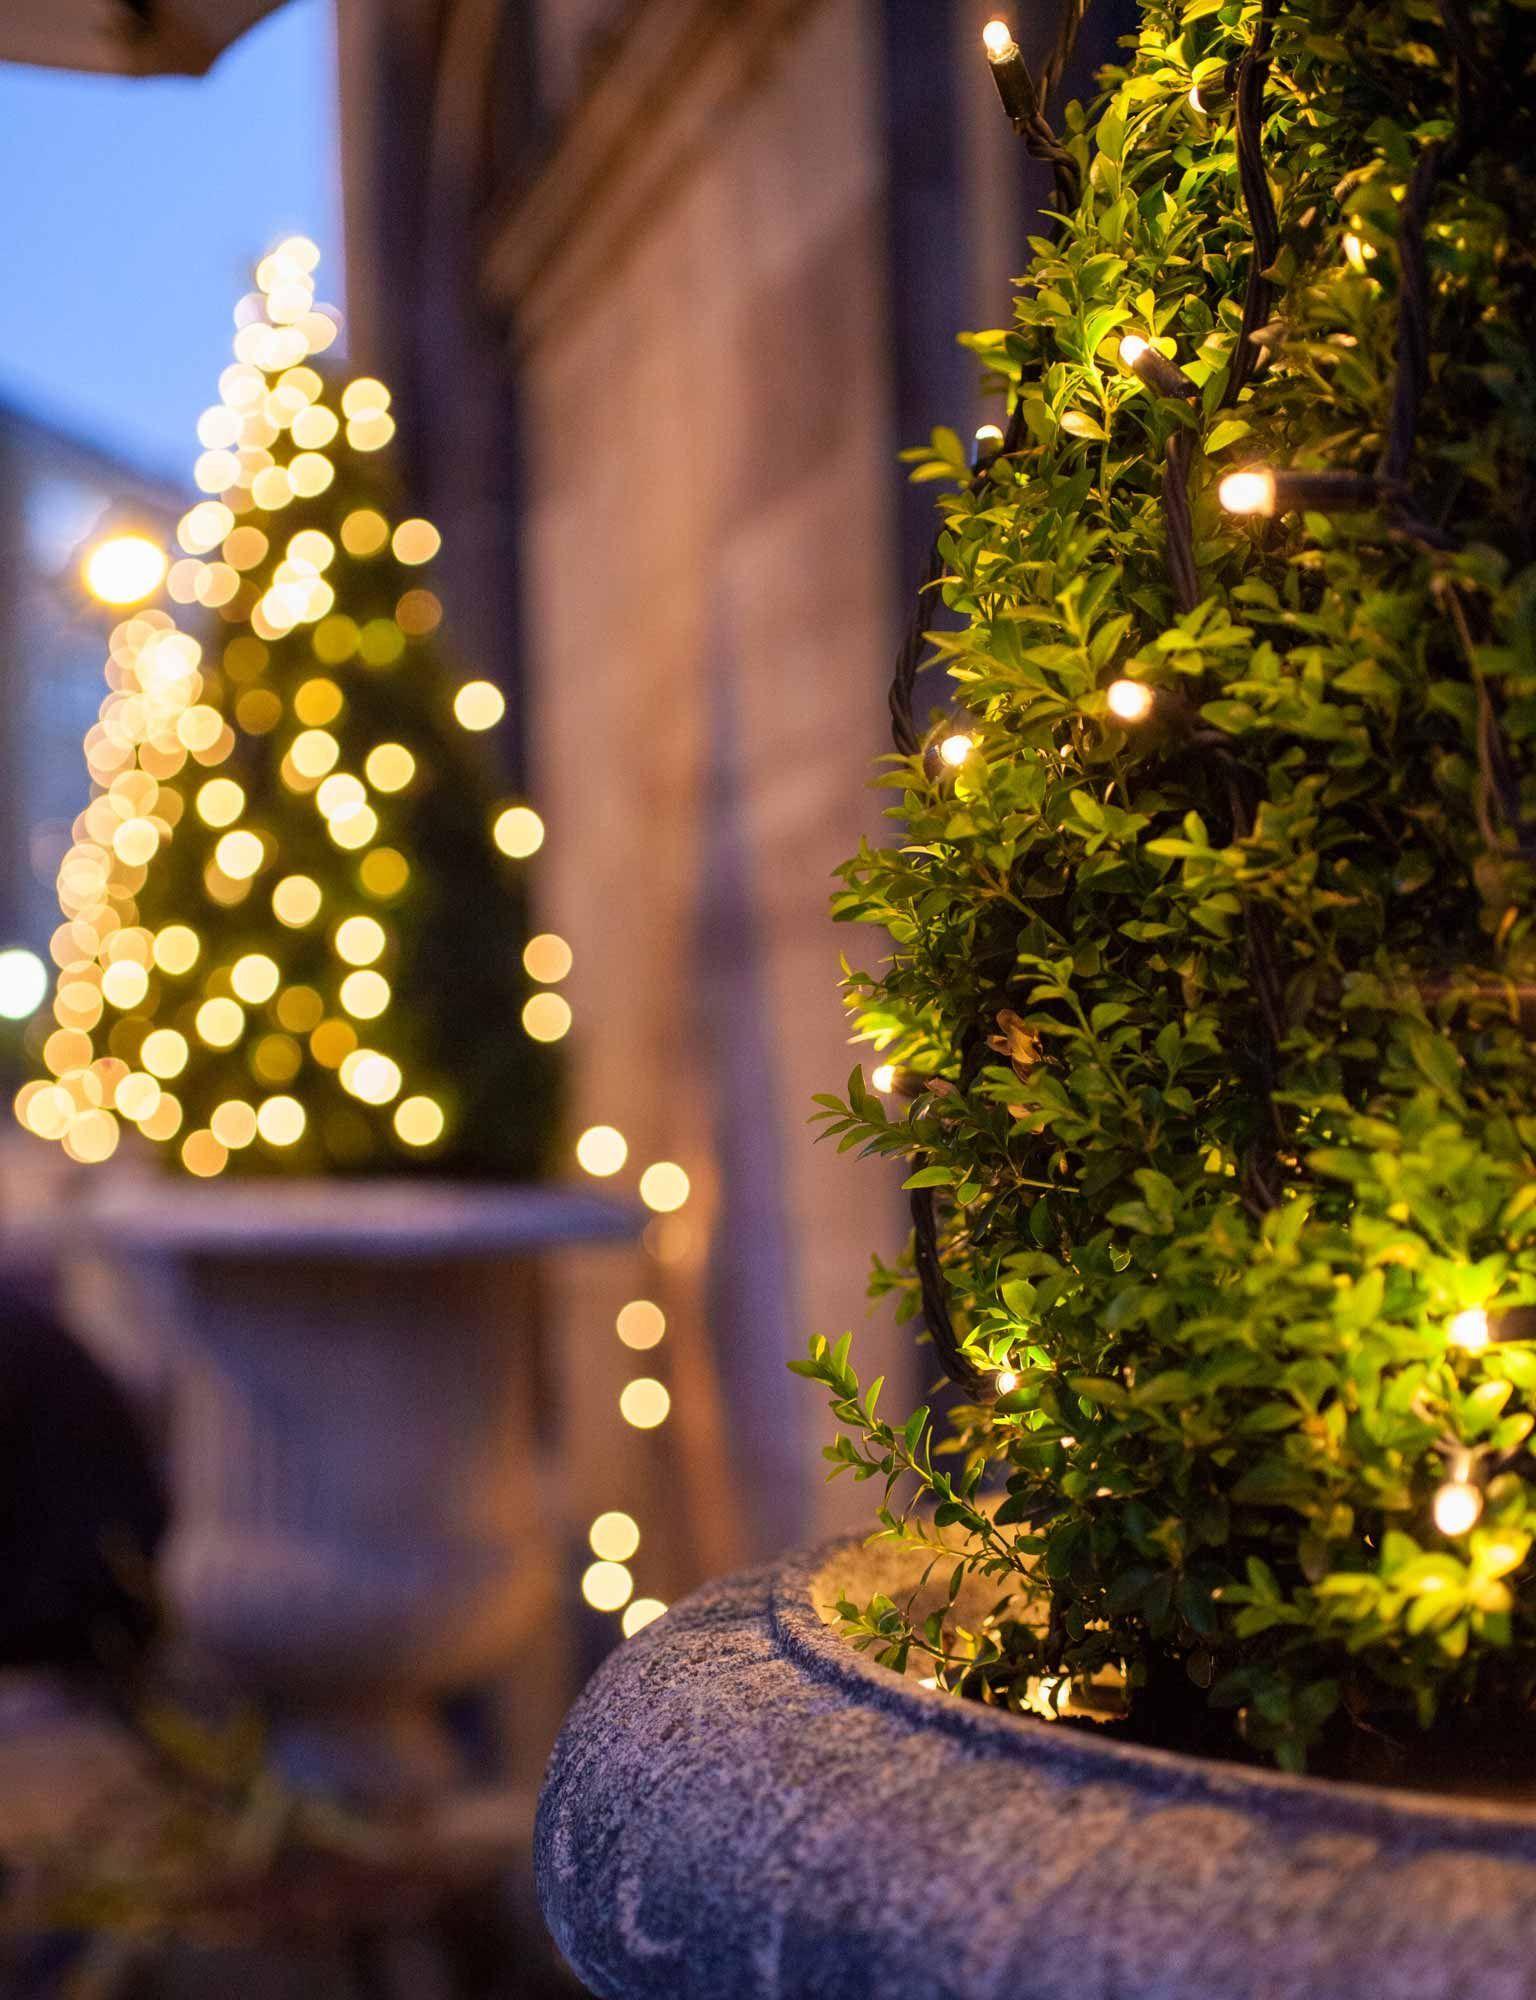 Consider fixing outdoor Christmas lights in the surrounding garden ...